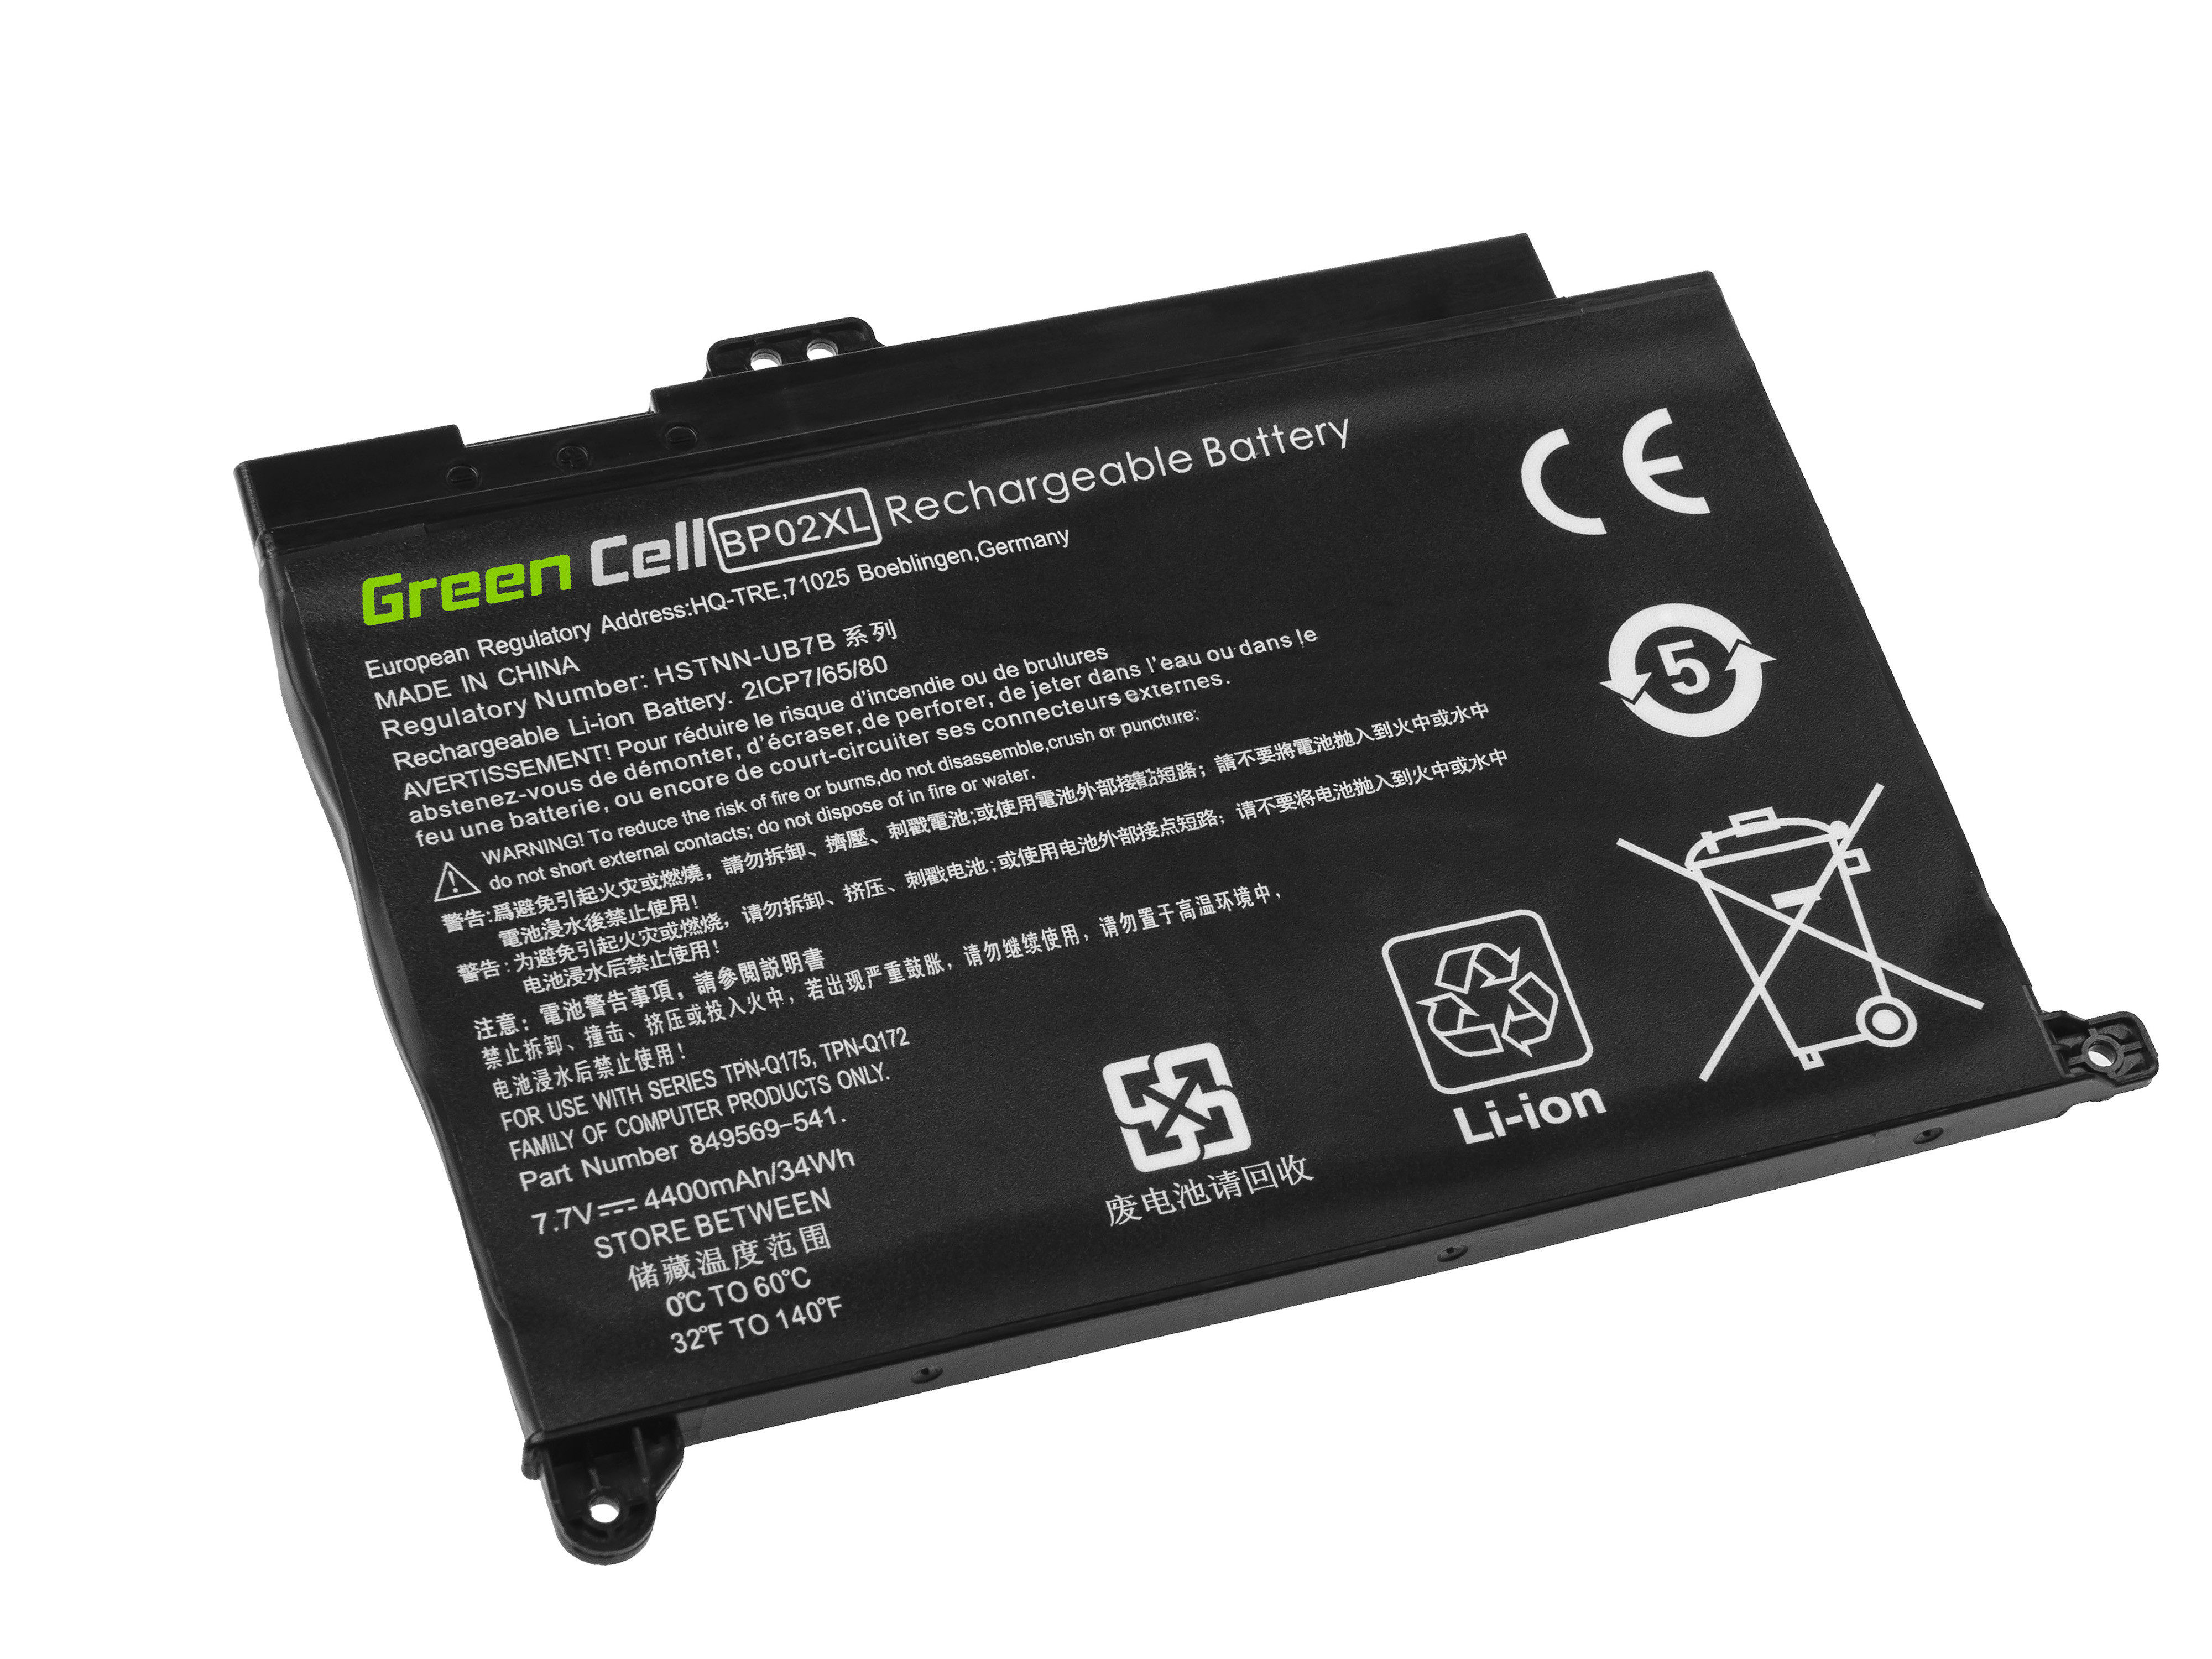 Green Cell HP150 Baterie HP BP02XL pro HP Pavilion 15-AU 15-AU051NW 15-AU071NW 15-AU102NW 15-AU107NW 15-AW 15-AW010NW 4400mAh Li-Pol – neoriginální